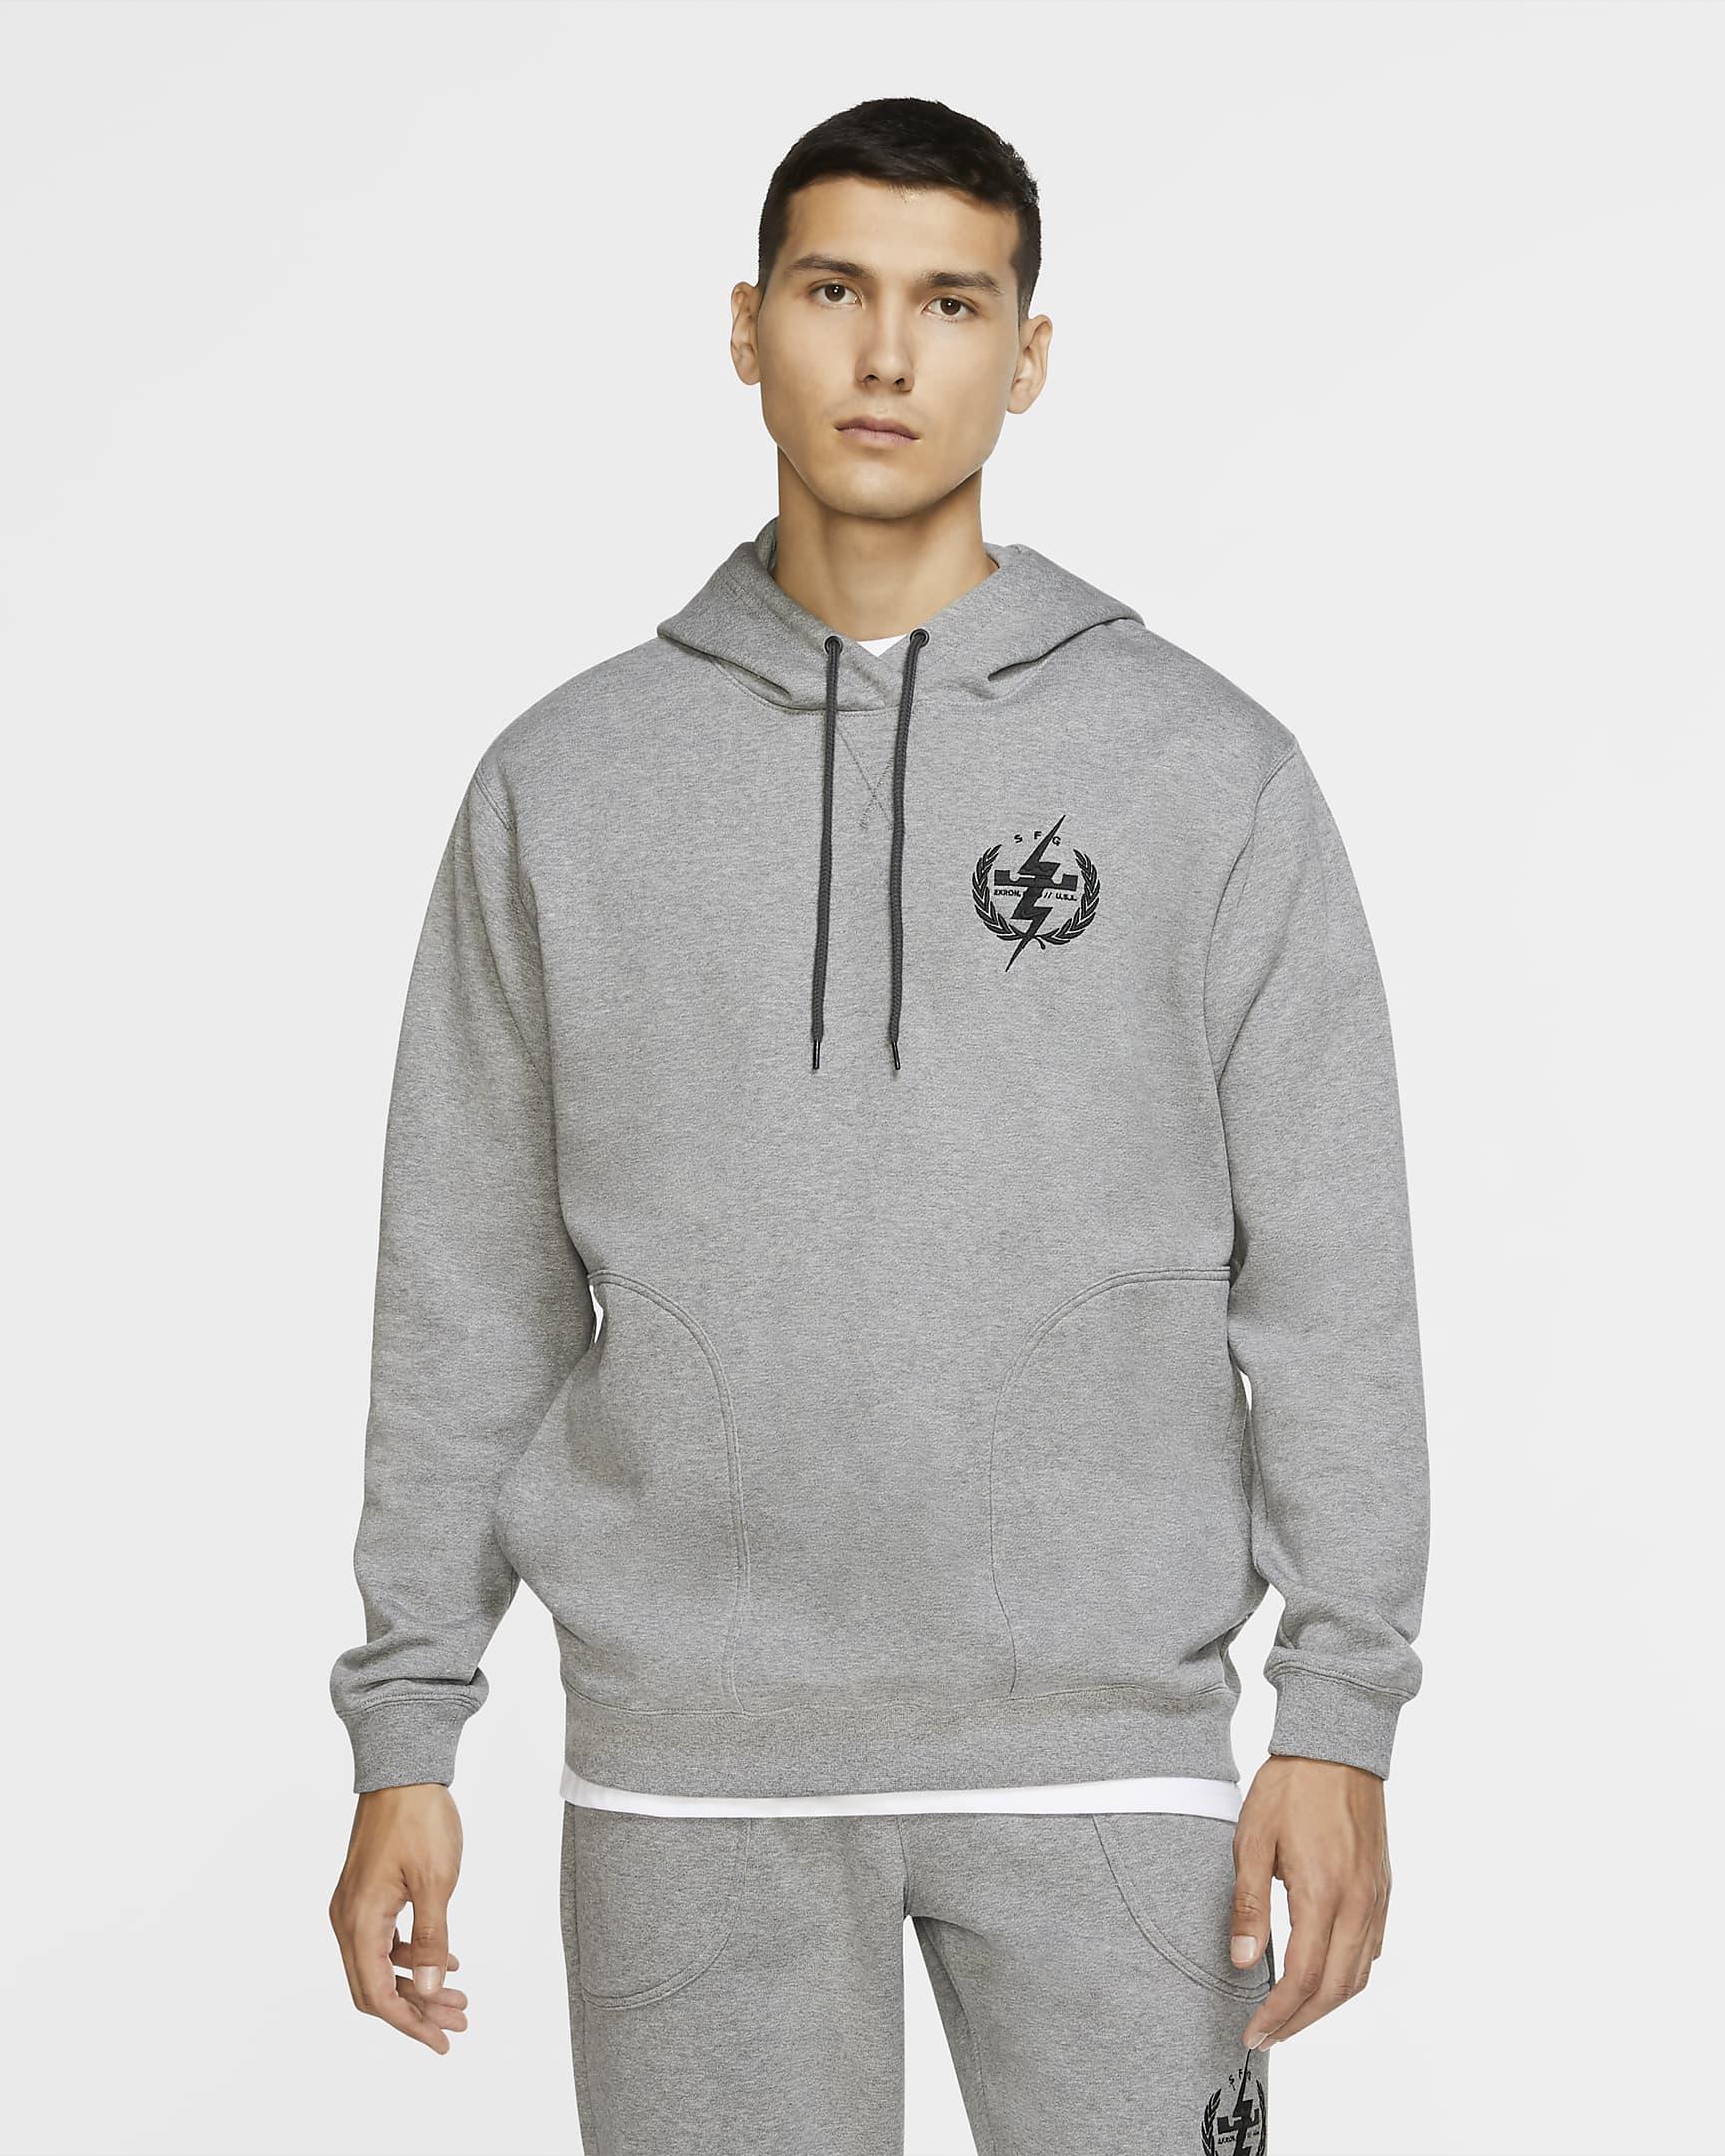 lebron-mens-pullover-hoodie-PmPN2T-2